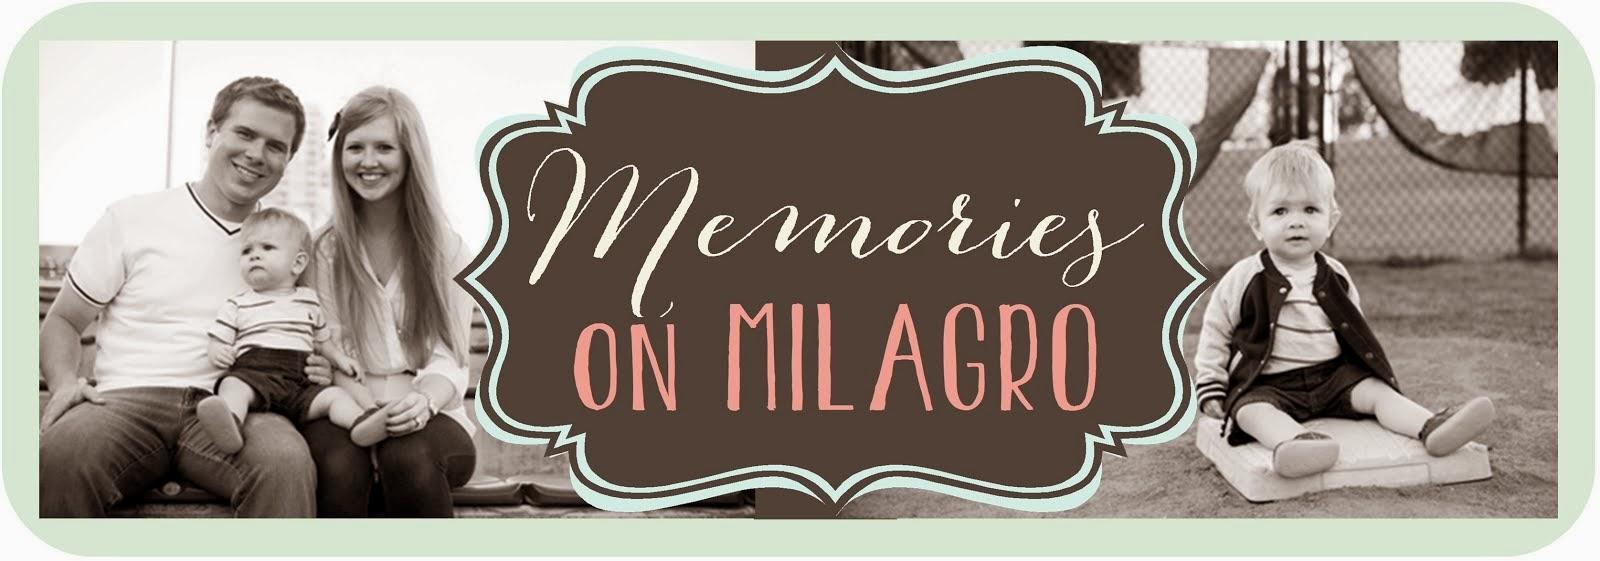 Memories on Milagro